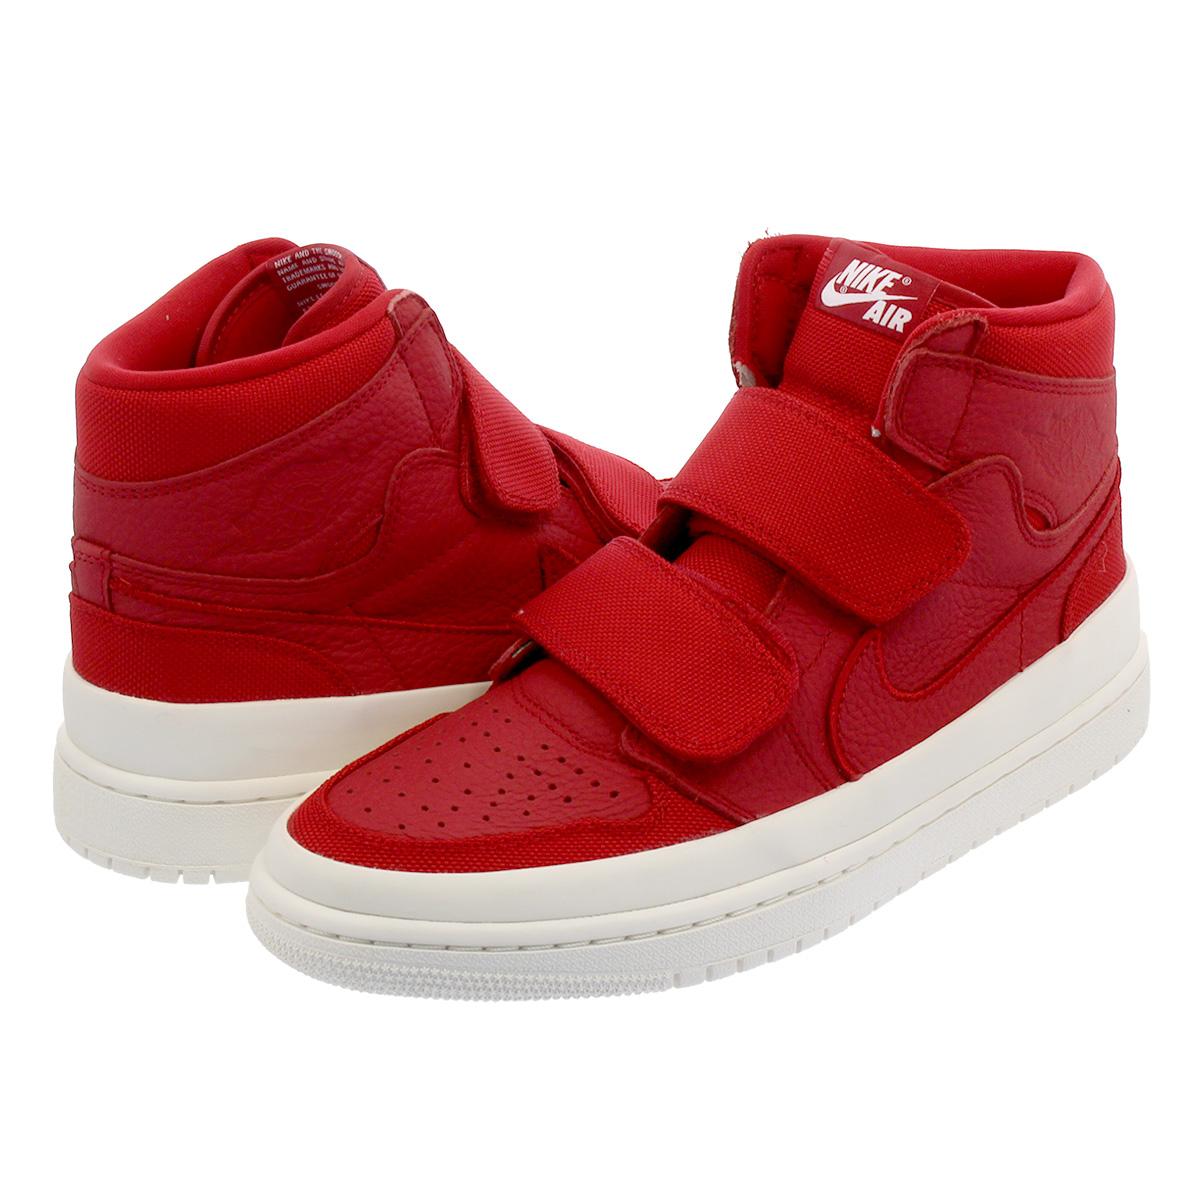 NIKE AIR JORDAN 1 RETRO HI DOUBLE STRP Nike Air Jordan 1 nostalgic high  double trap GYM RED GYM RED SAIL WHITE aq7924-601 5d2db97934b